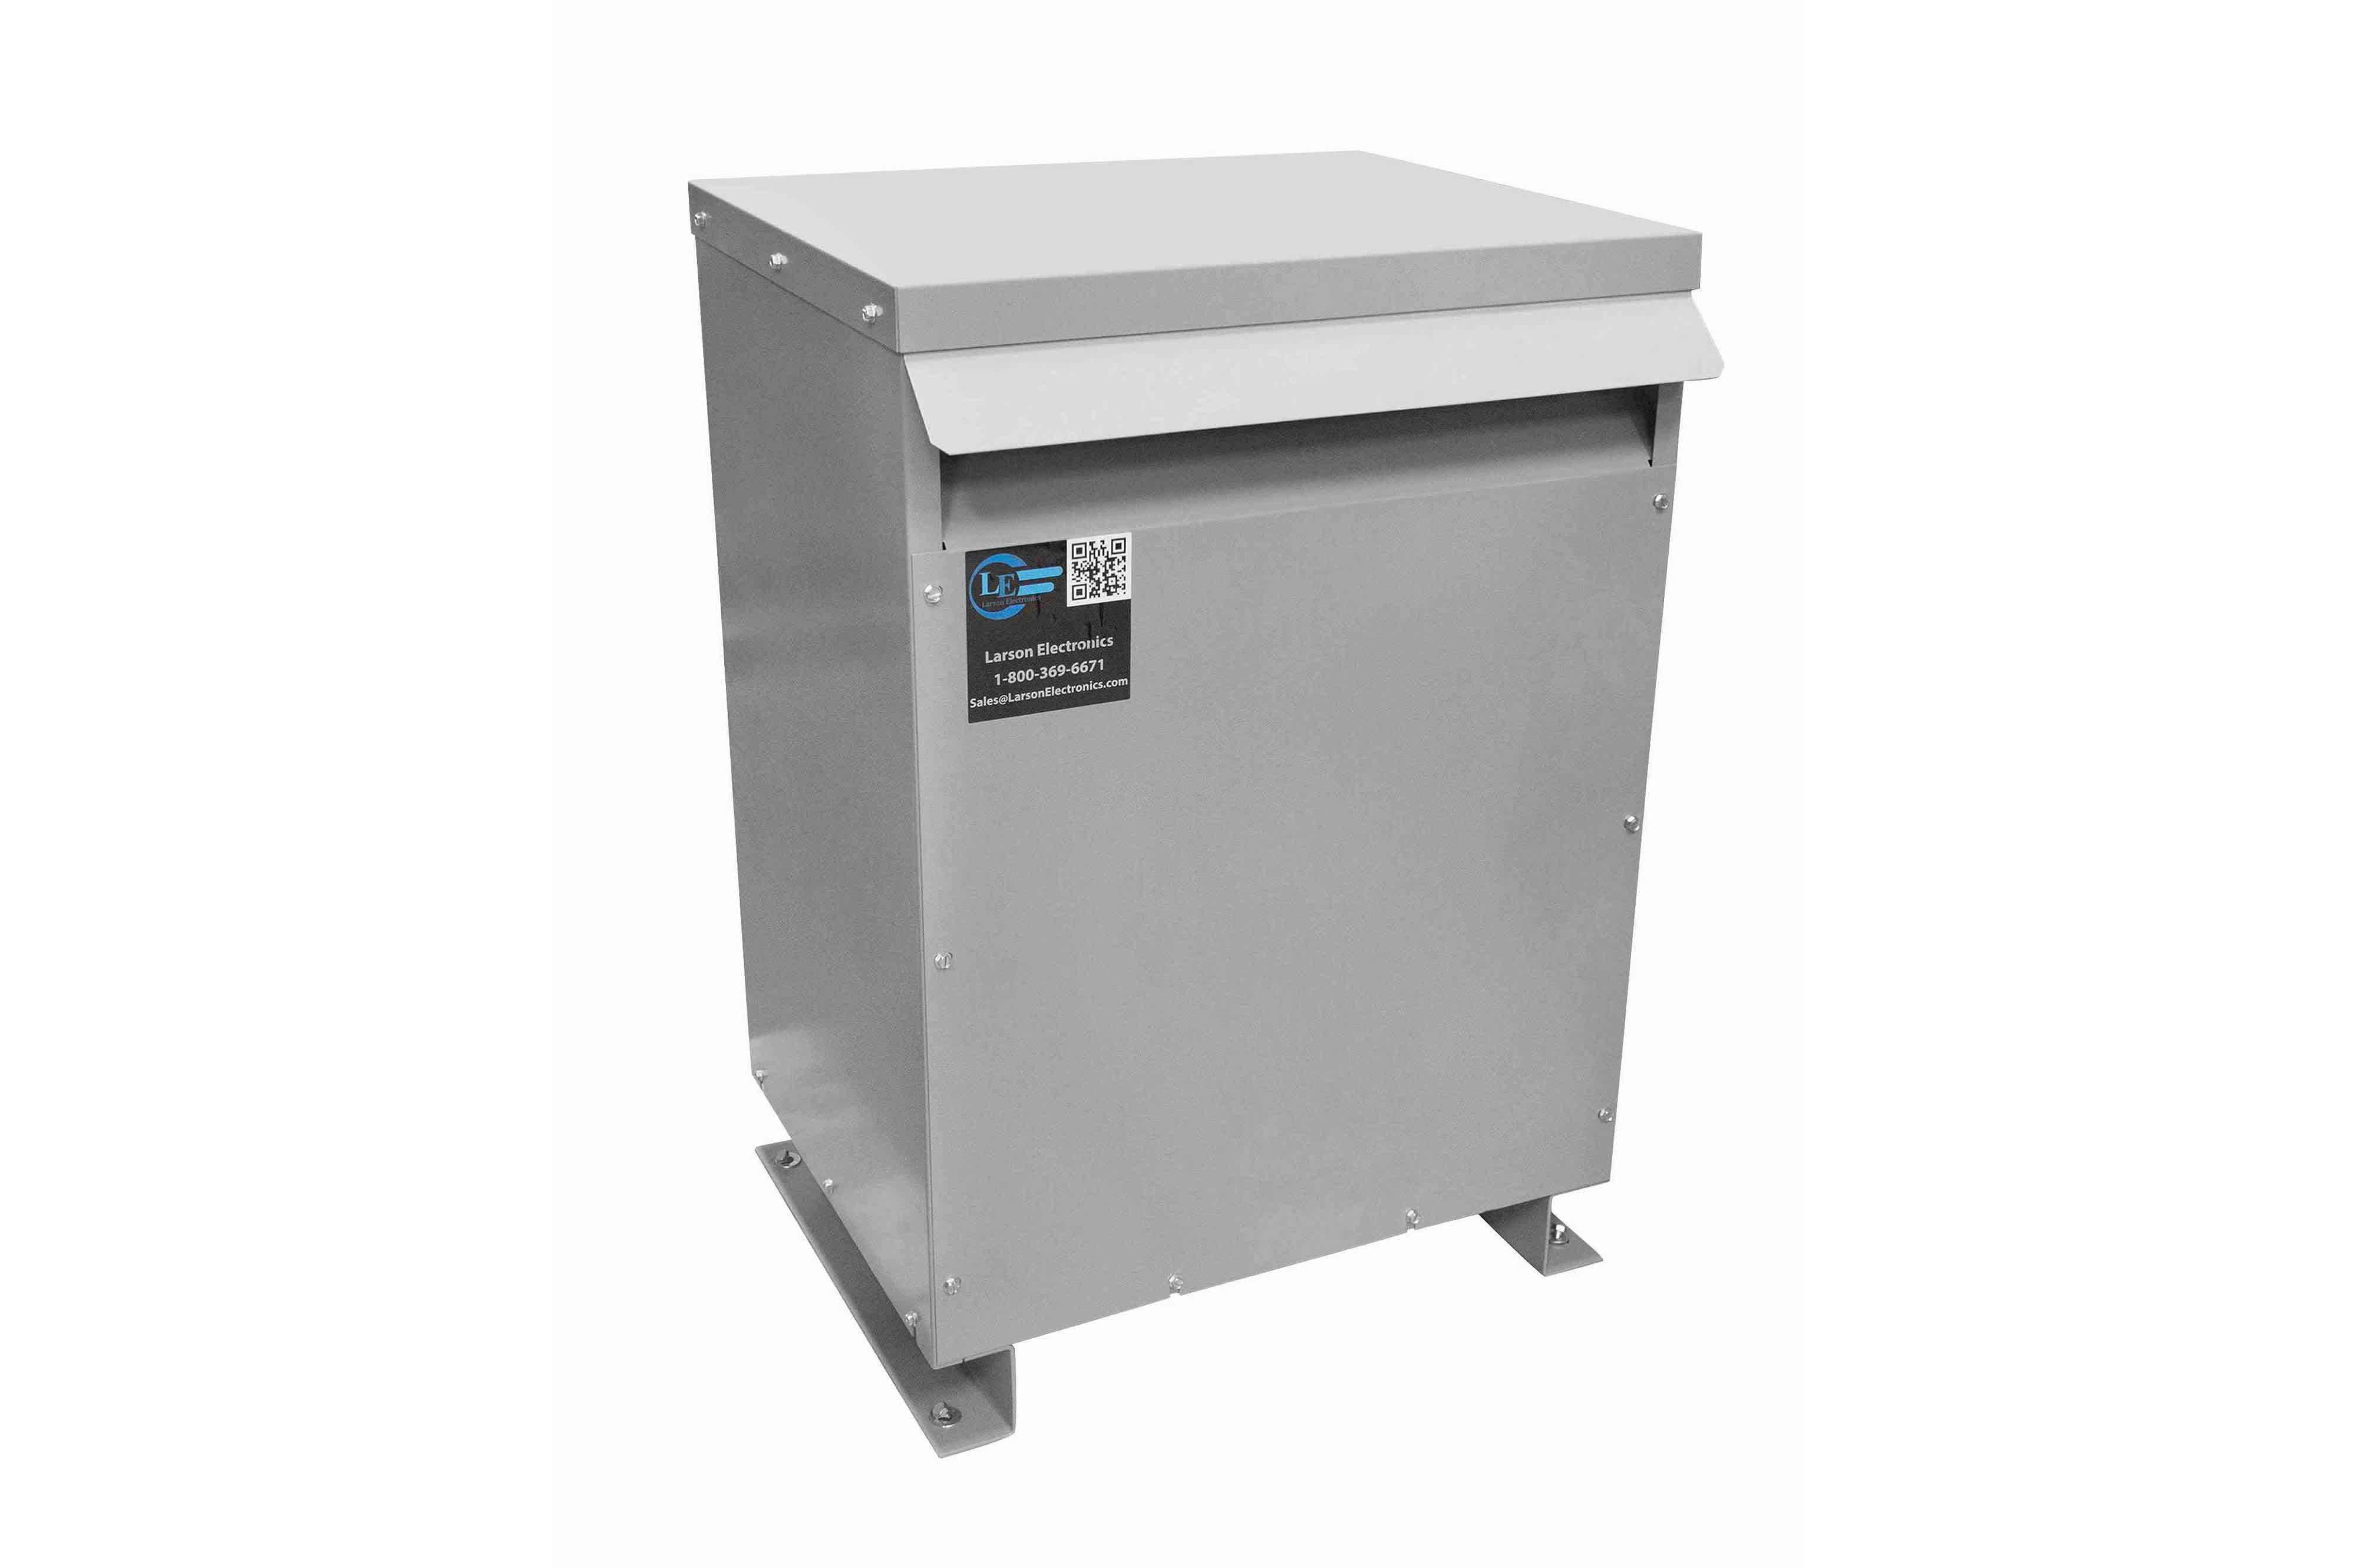 90 kVA 3PH Isolation Transformer, 240V Wye Primary, 480V Delta Secondary, N3R, Ventilated, 60 Hz